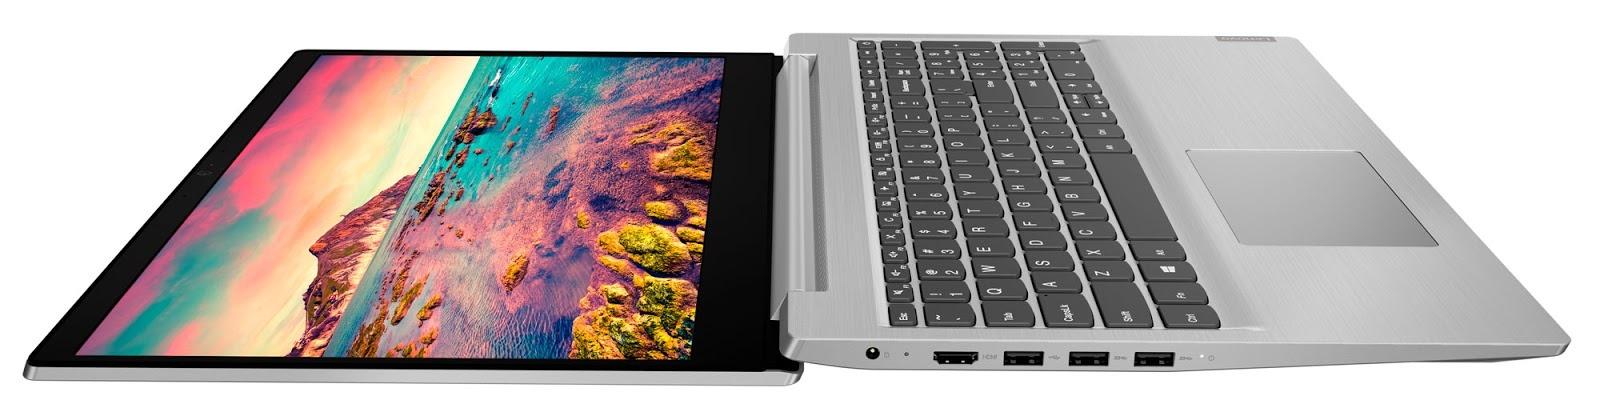 Фото 3. Ноутбук Lenovo ideapad S145-15AST (81N300EYRE)